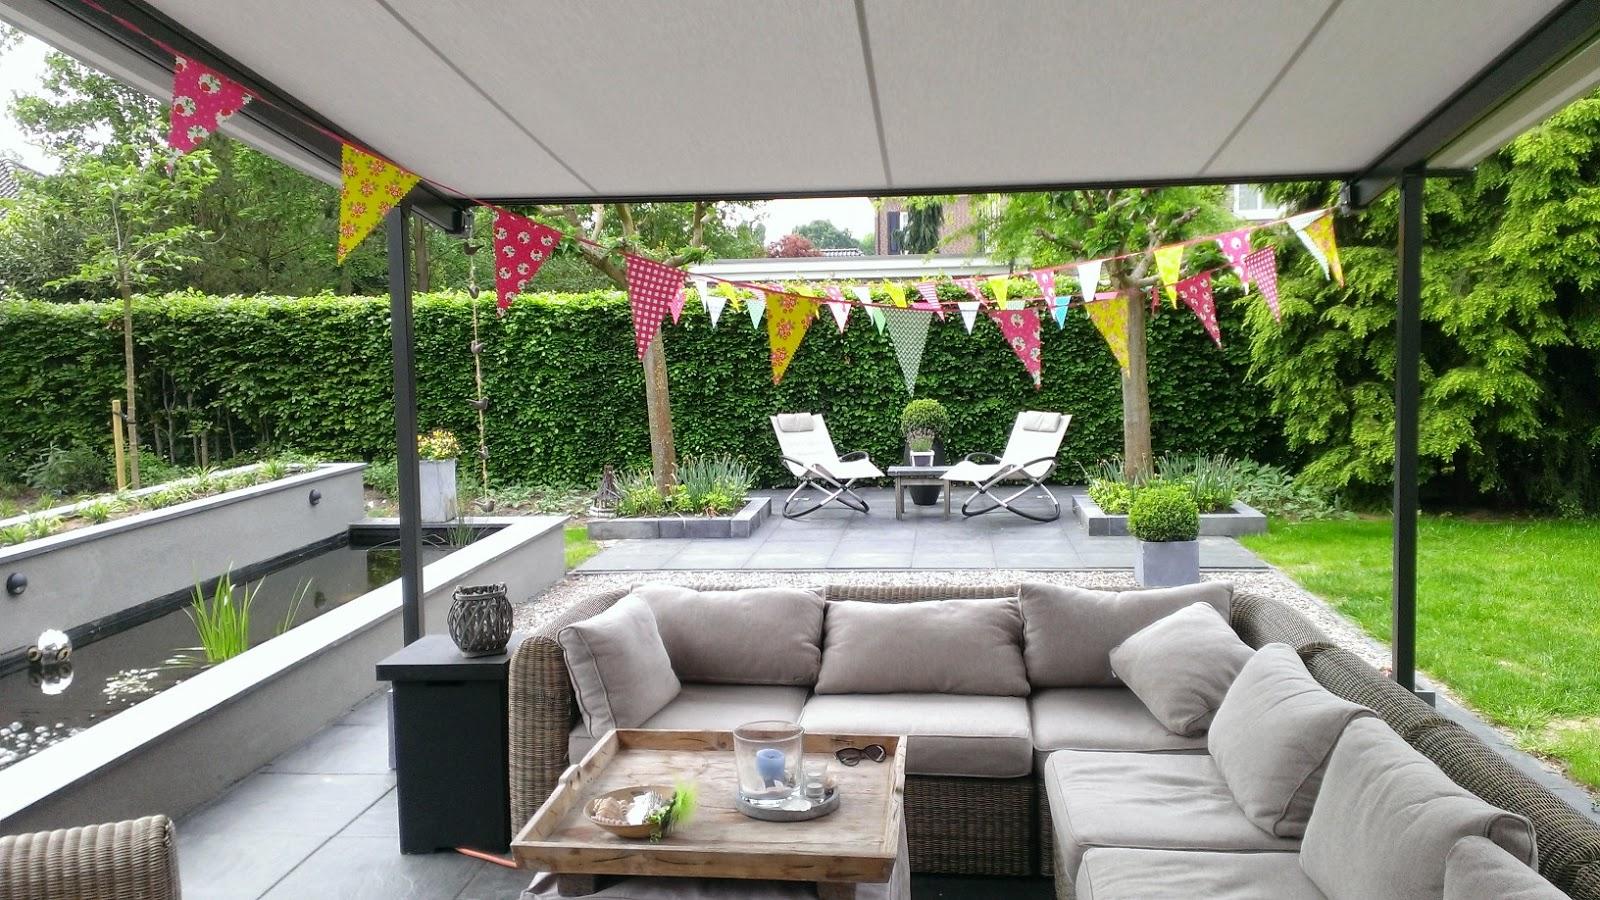 CYNtuinen tuinontwerp & -advies: Renovatie tuin Deventer ...